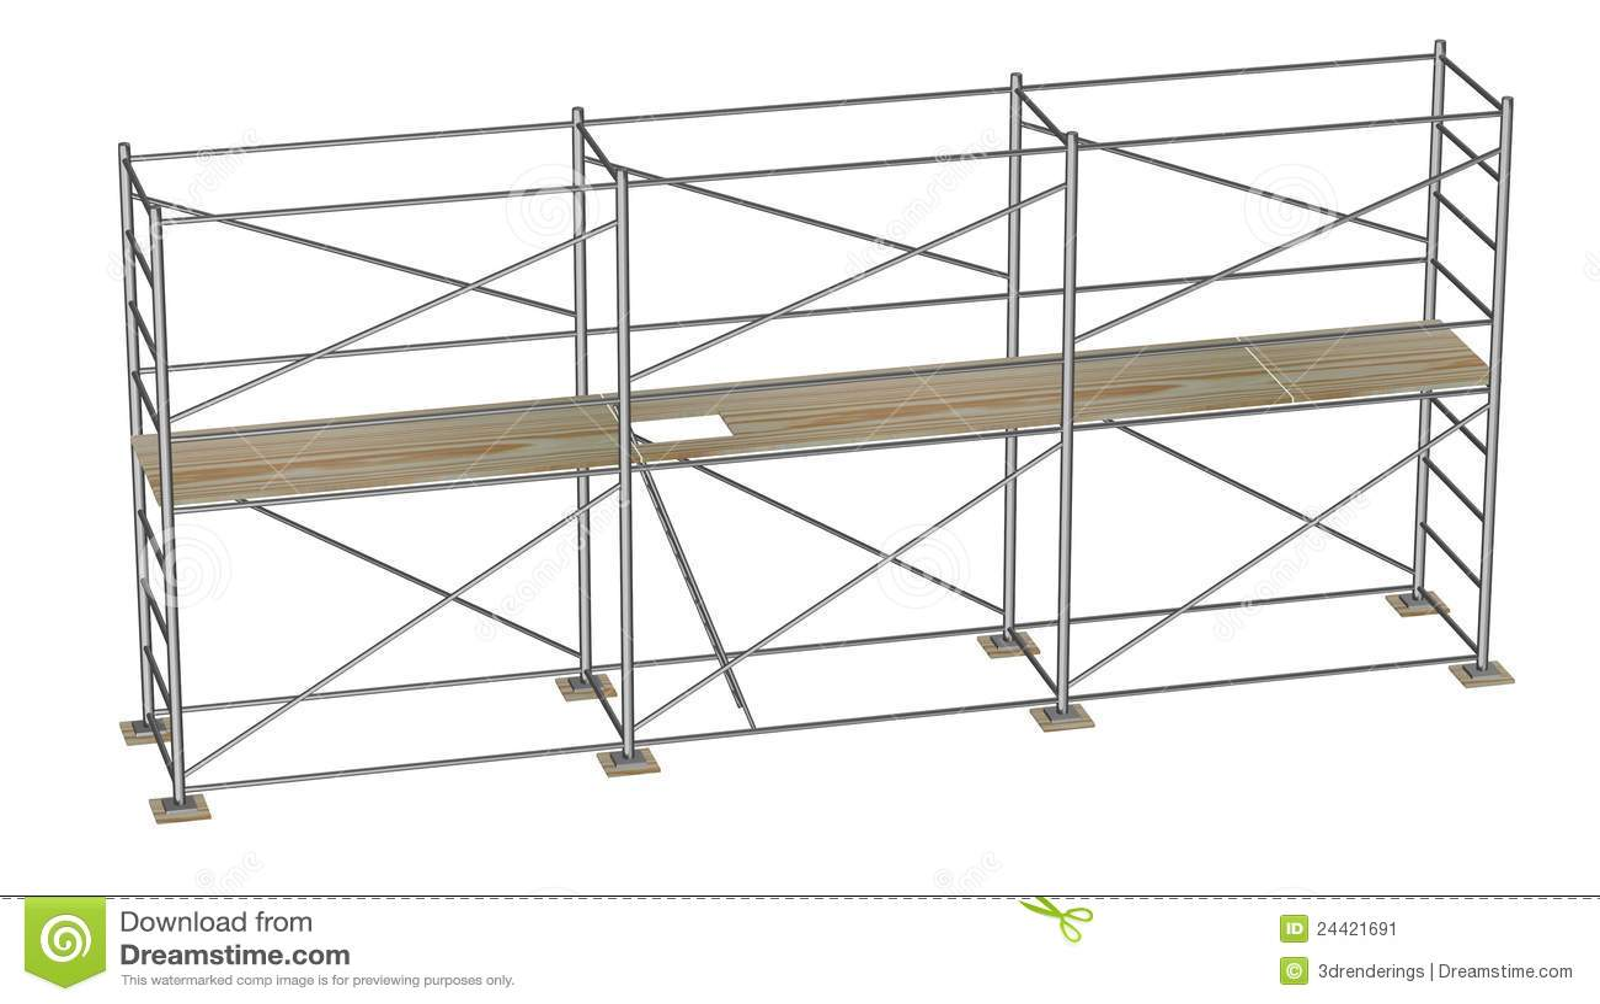 Construction Scaffolding Design : Construction scaffolding floors stock image